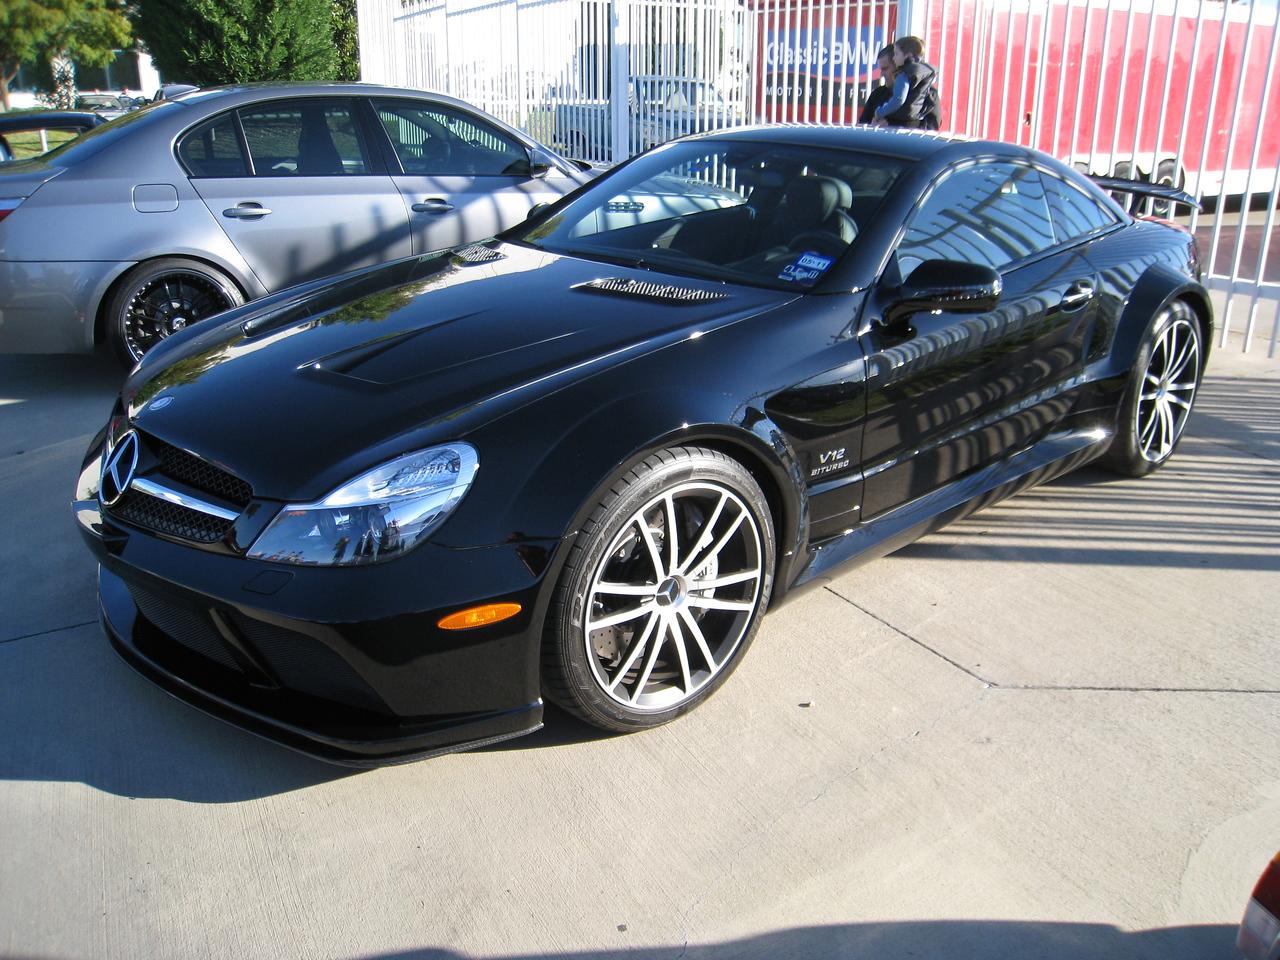 AMG SL65 Black series